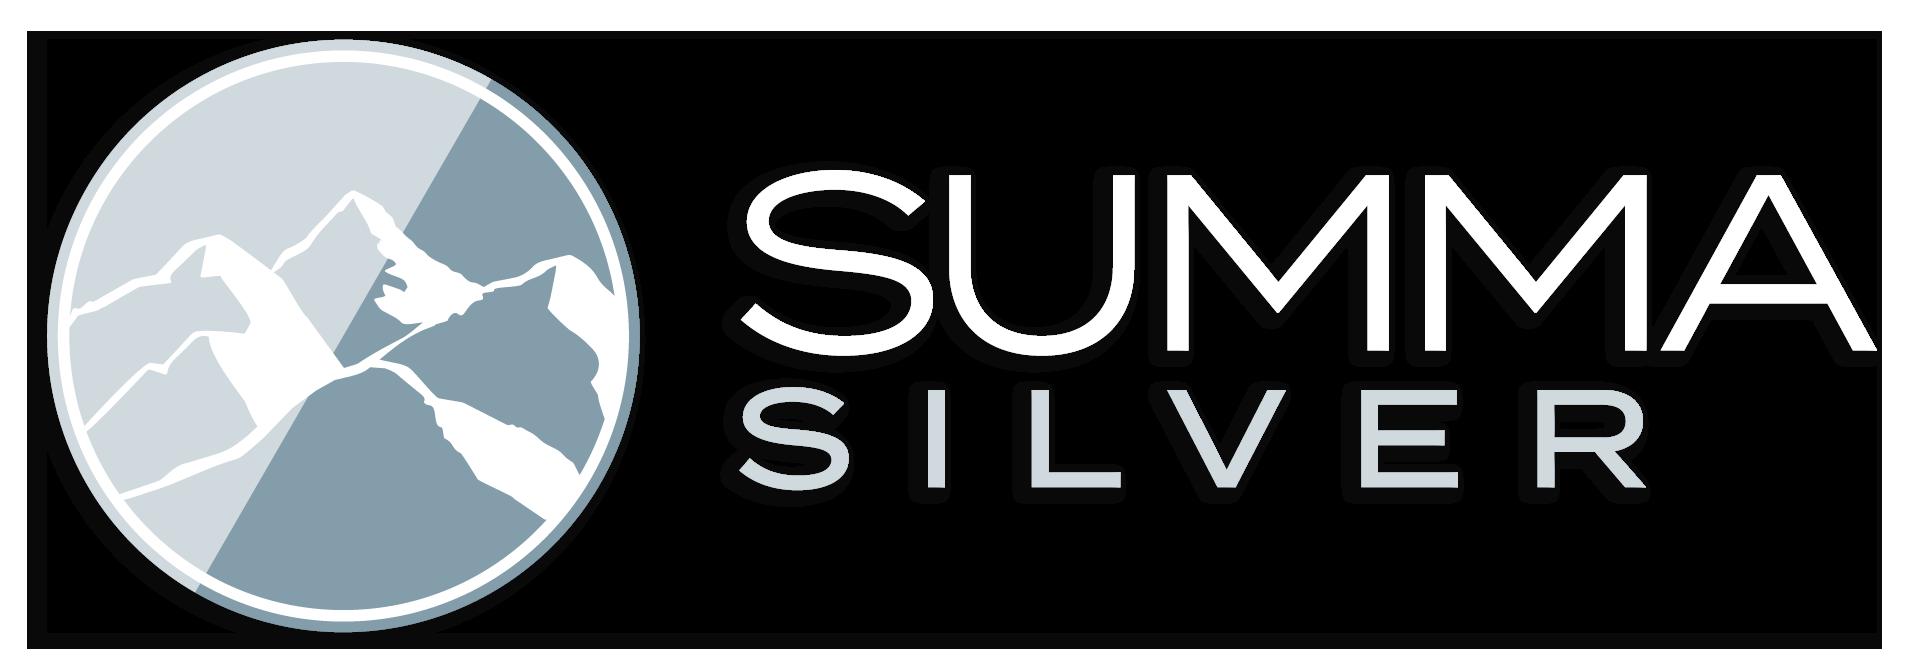 Summa Silver Corporation Logo